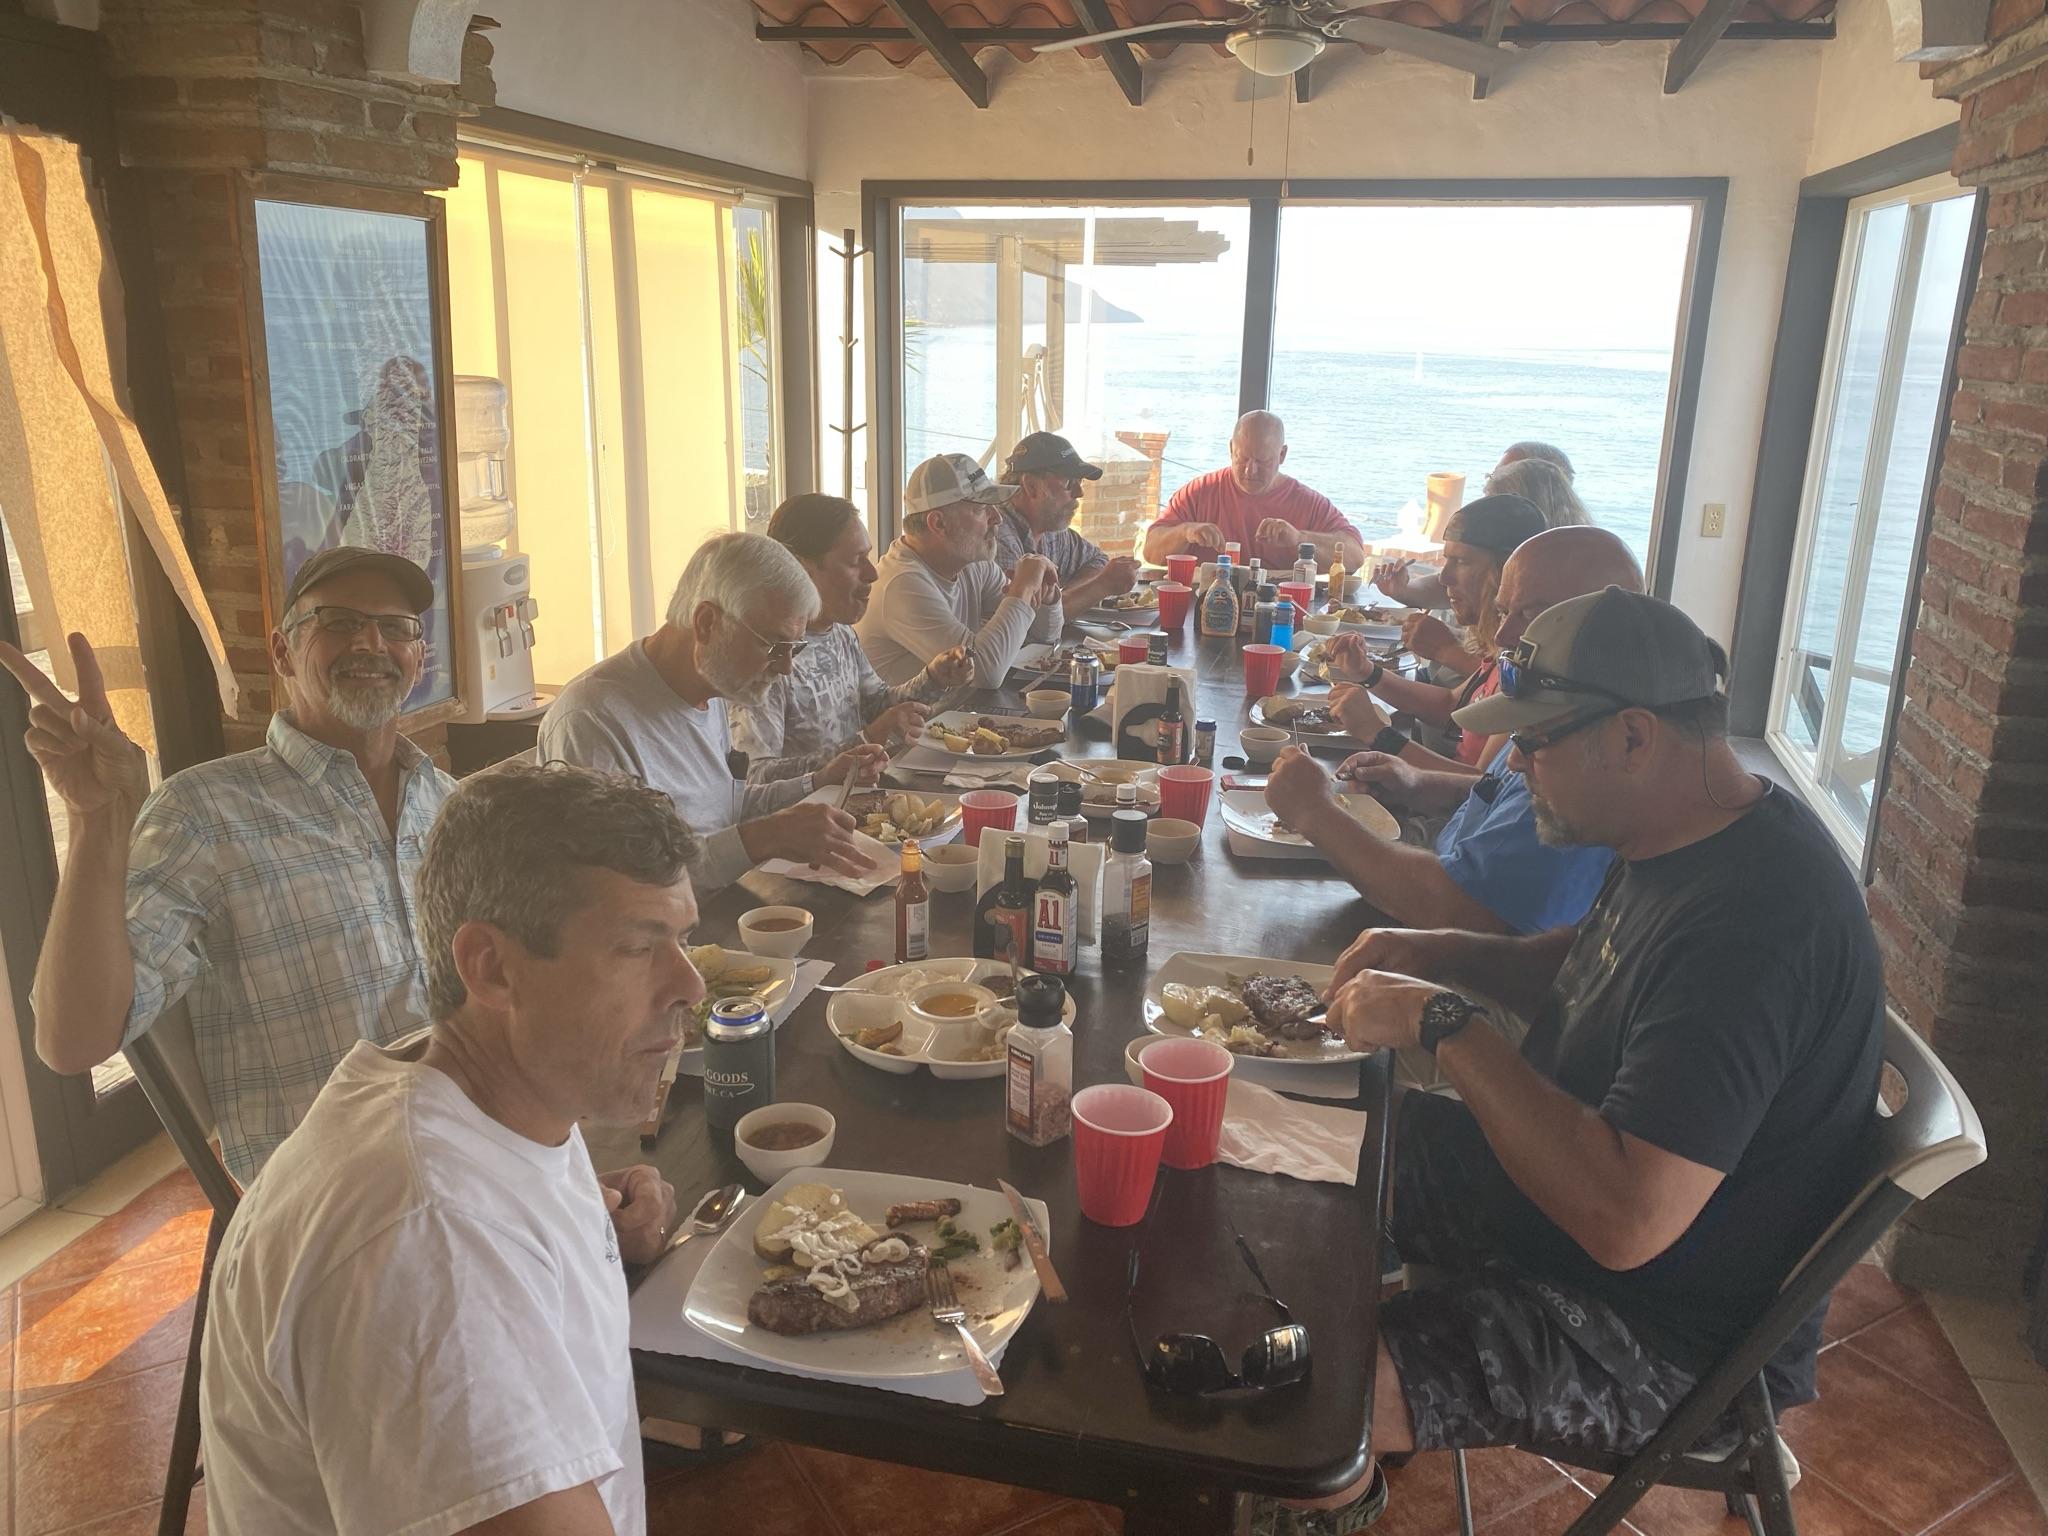 27 dining.JPEG